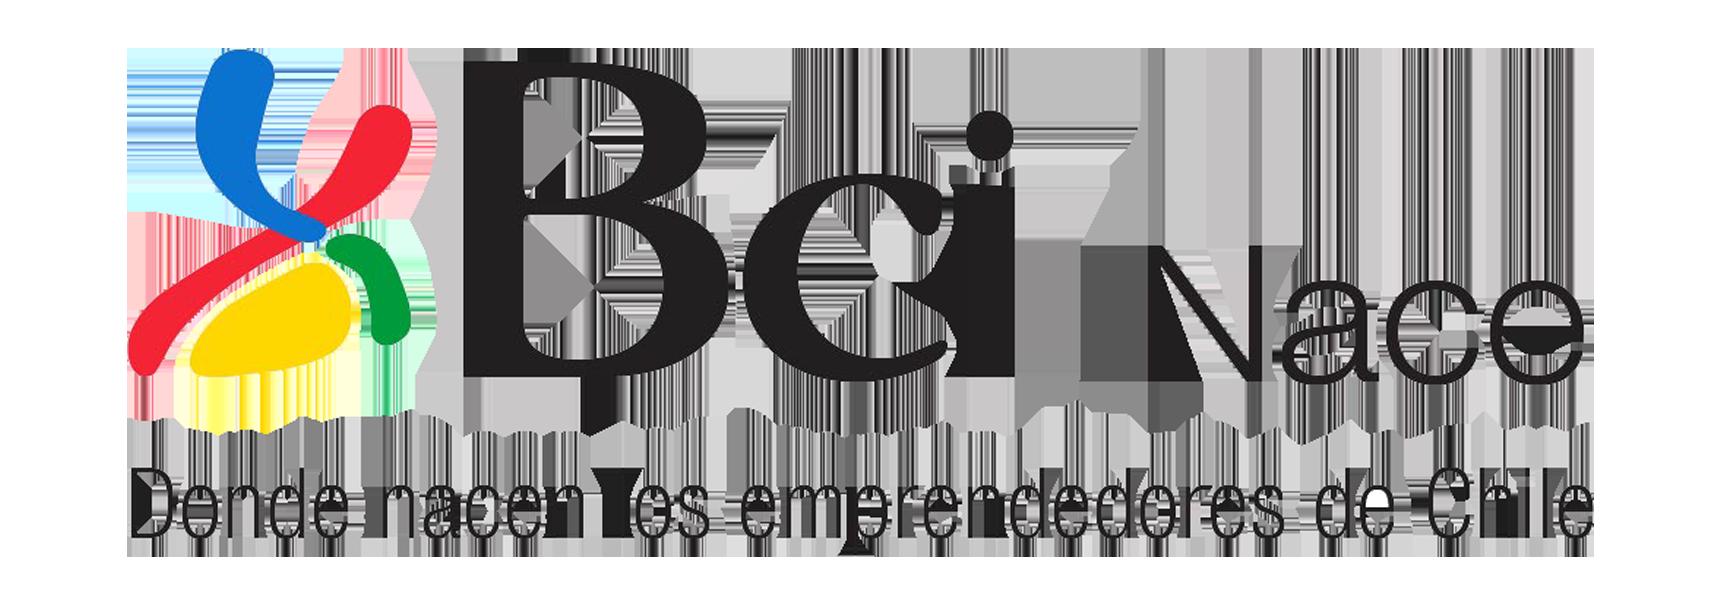 bci-2